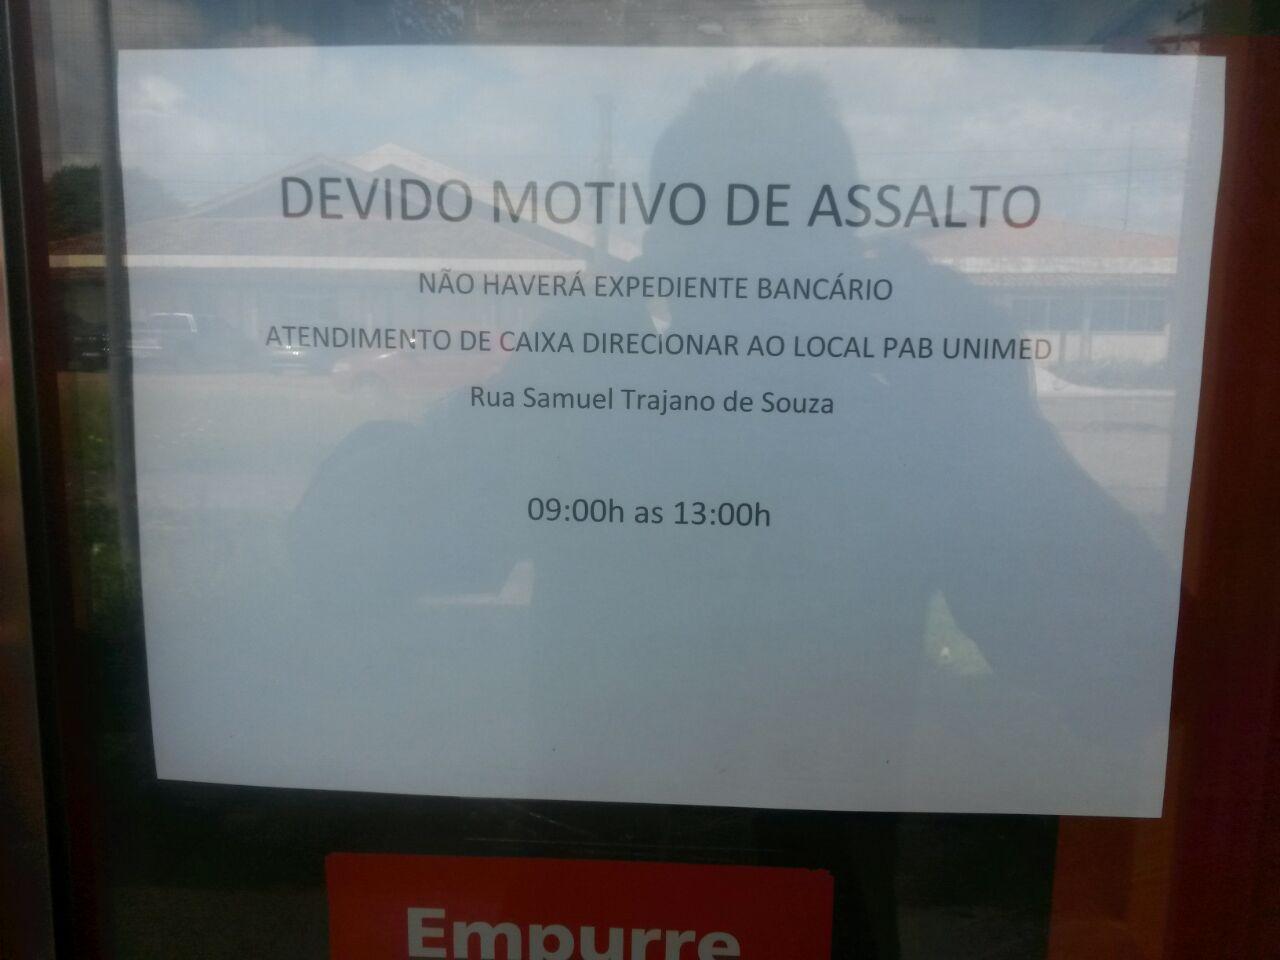 Bandidos levam R$ 47 mil de agência na Unifap